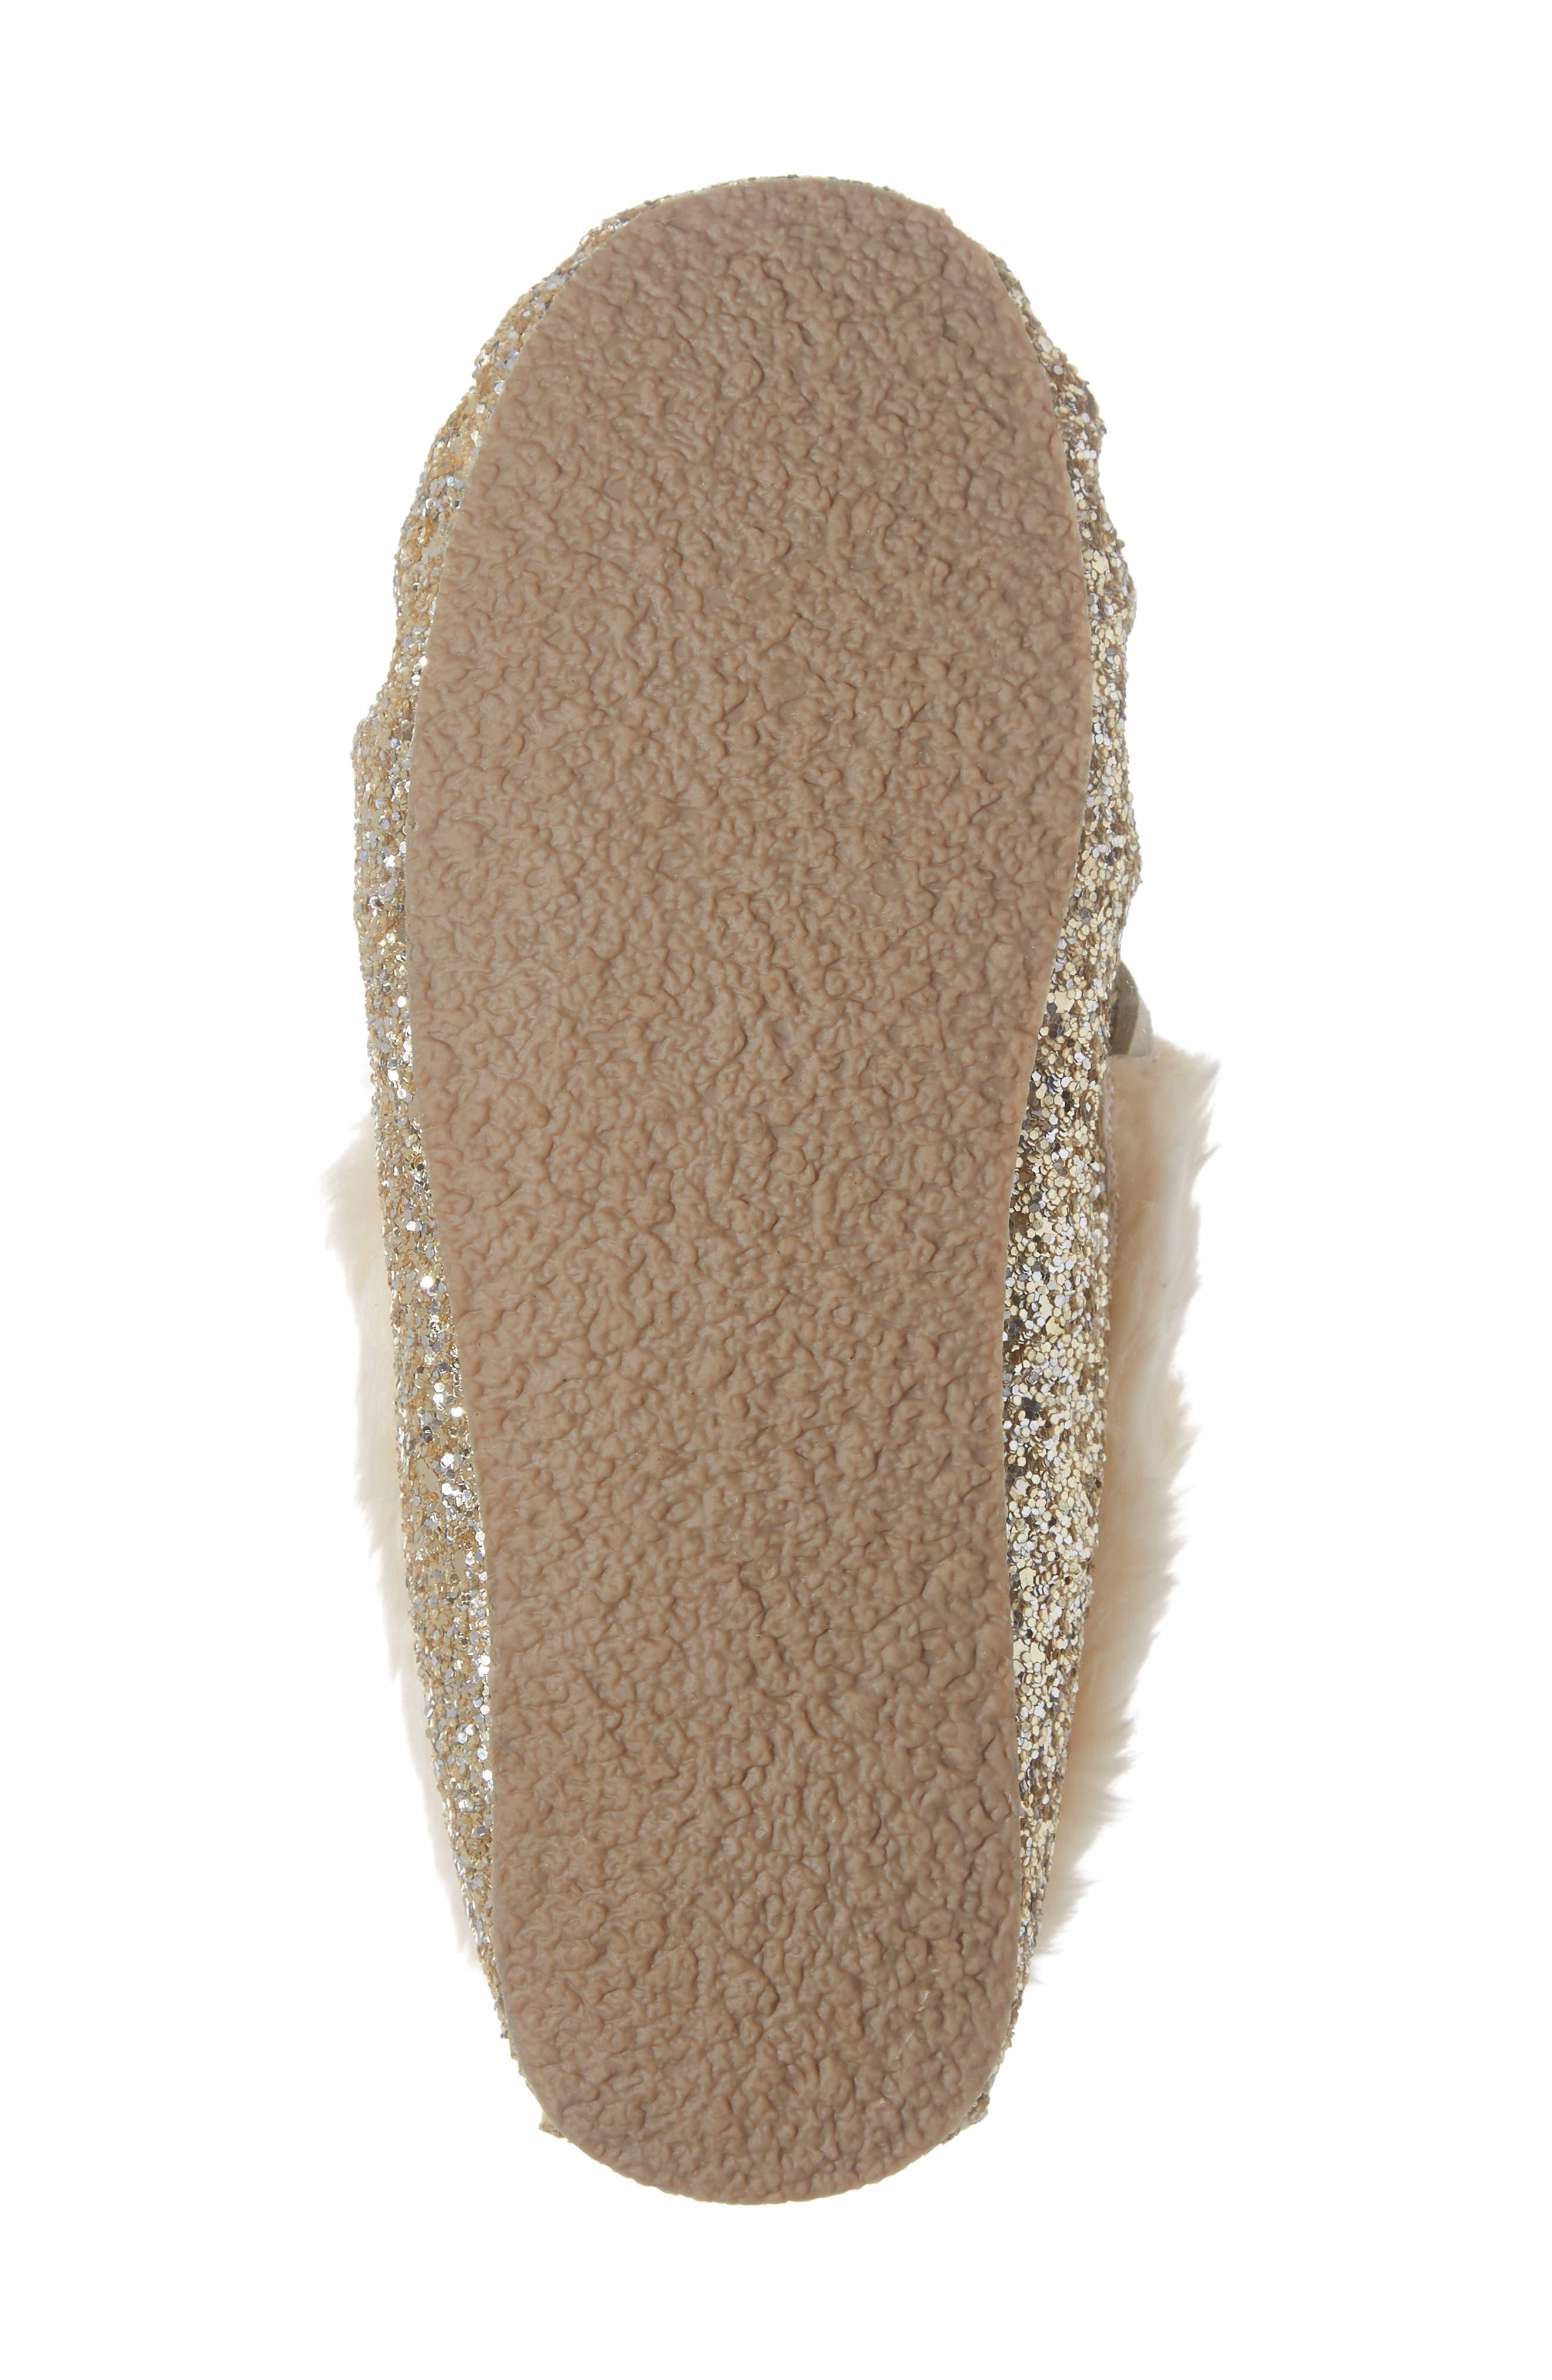 CREWCUTS BY J.CREW,                             Glitter Moccasin Slipper,                             Alternate thumbnail 6, color,                             710